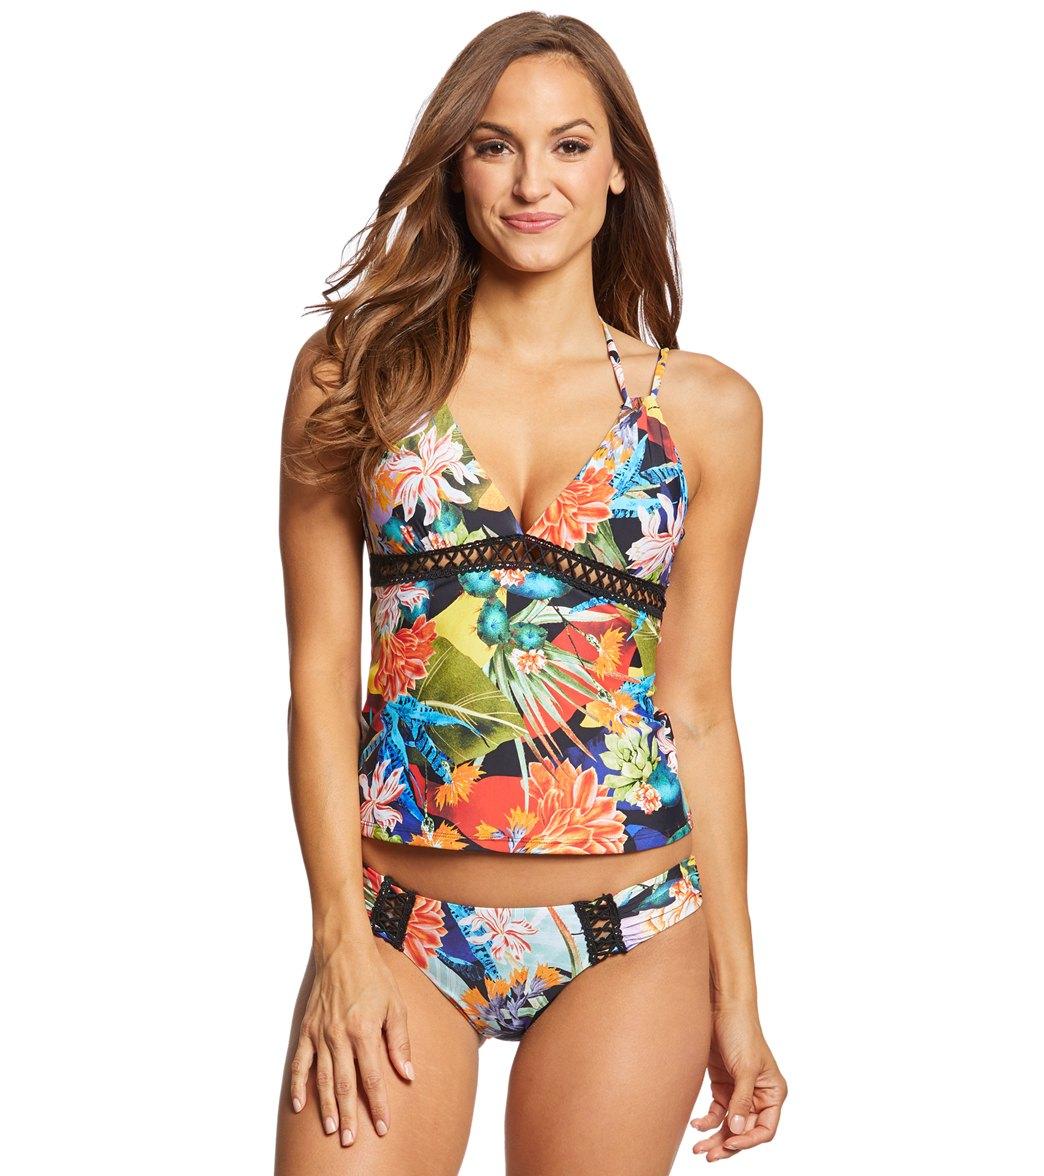 d765b1bfa76 Lucky Brand Malibu Canyon Tankini Top at SwimOutlet.com - Free Shipping